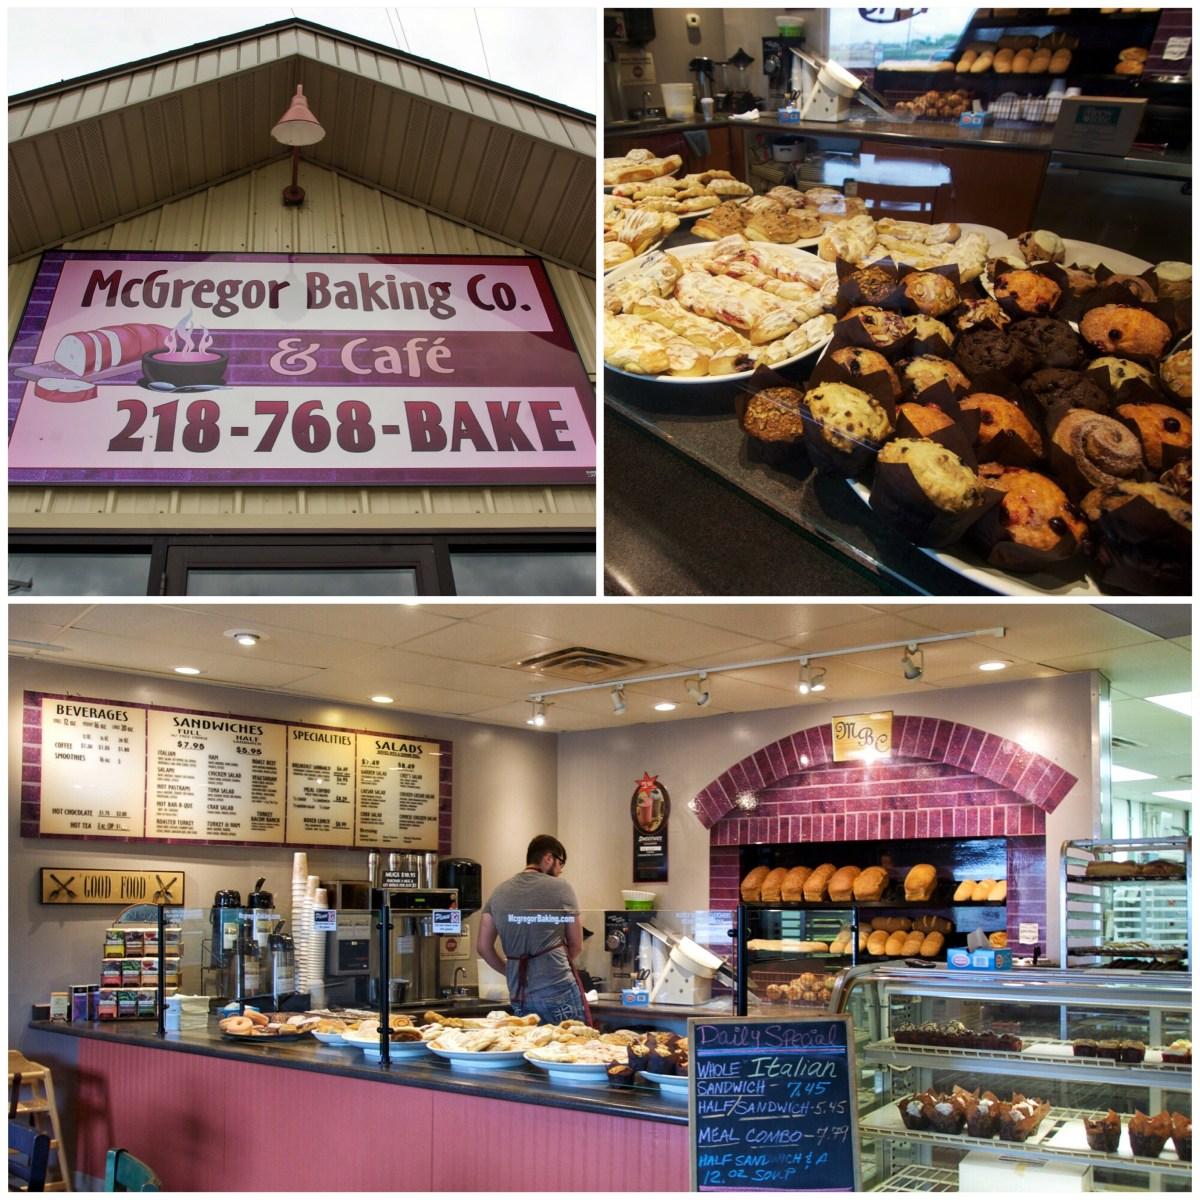 McGregor Baking Co.